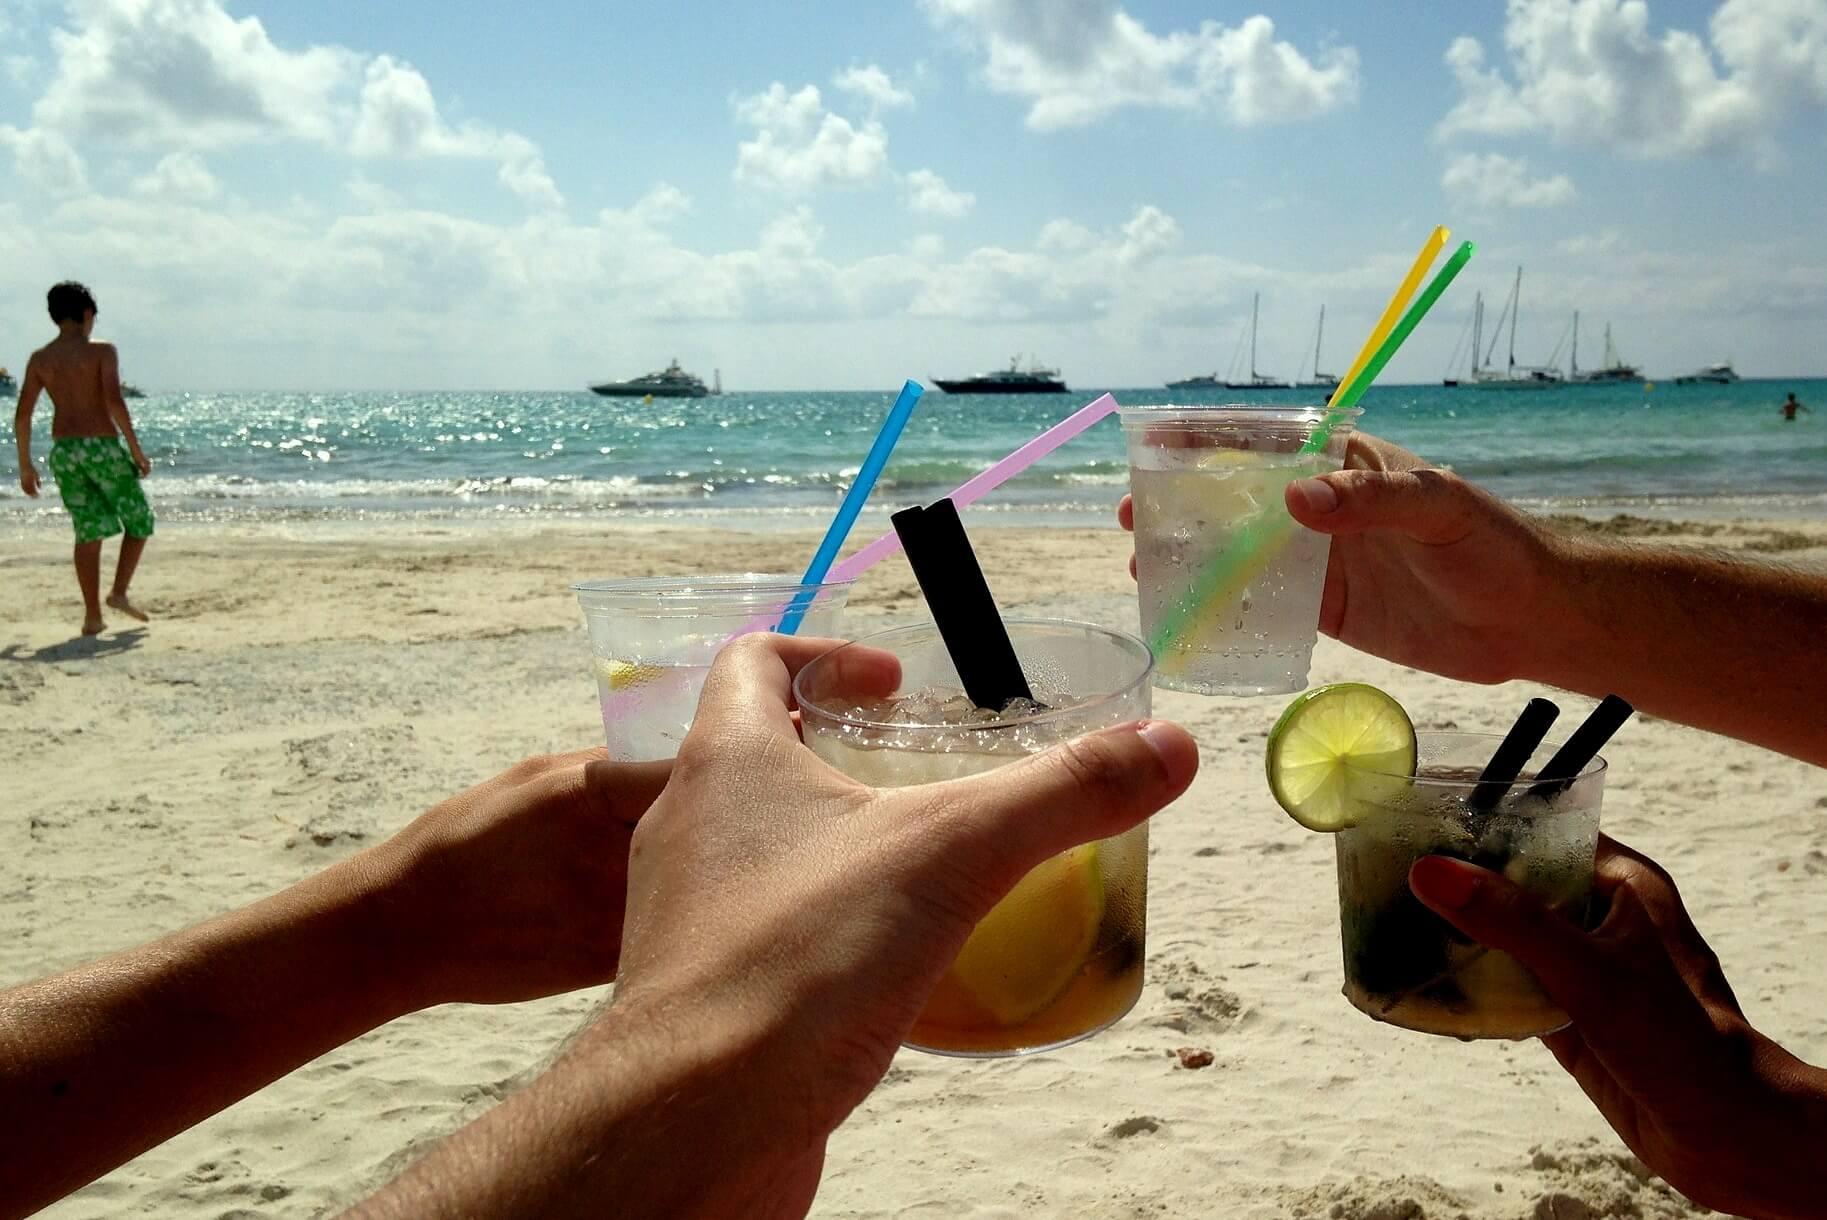 Cuba-travel-rum-cocktails-Havana-Glimpses-of-The-World